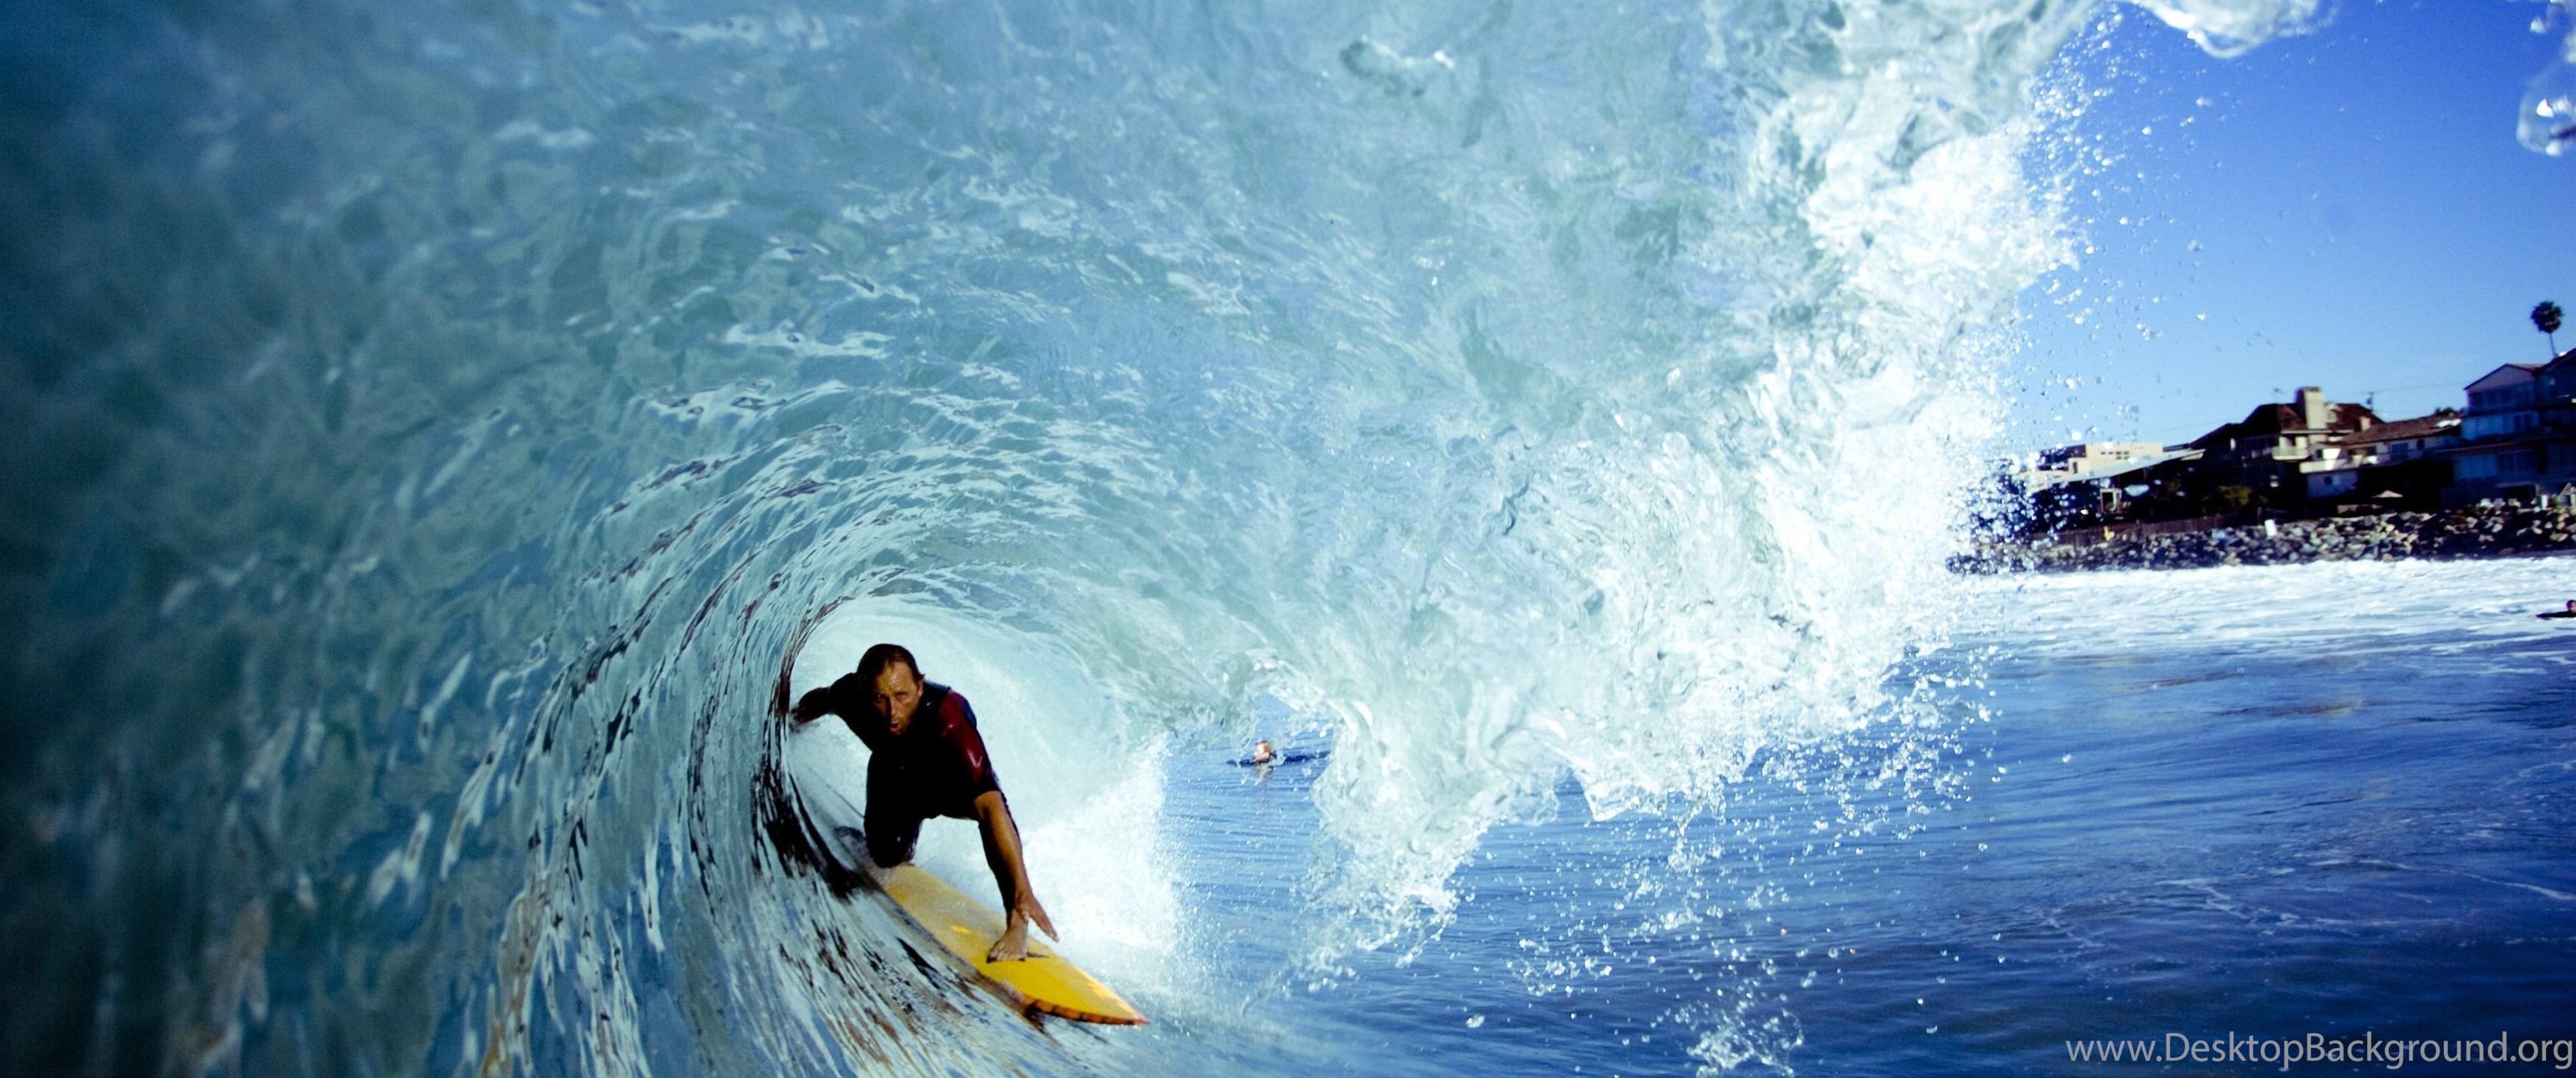 серфинг  № 3001414 бесплатно